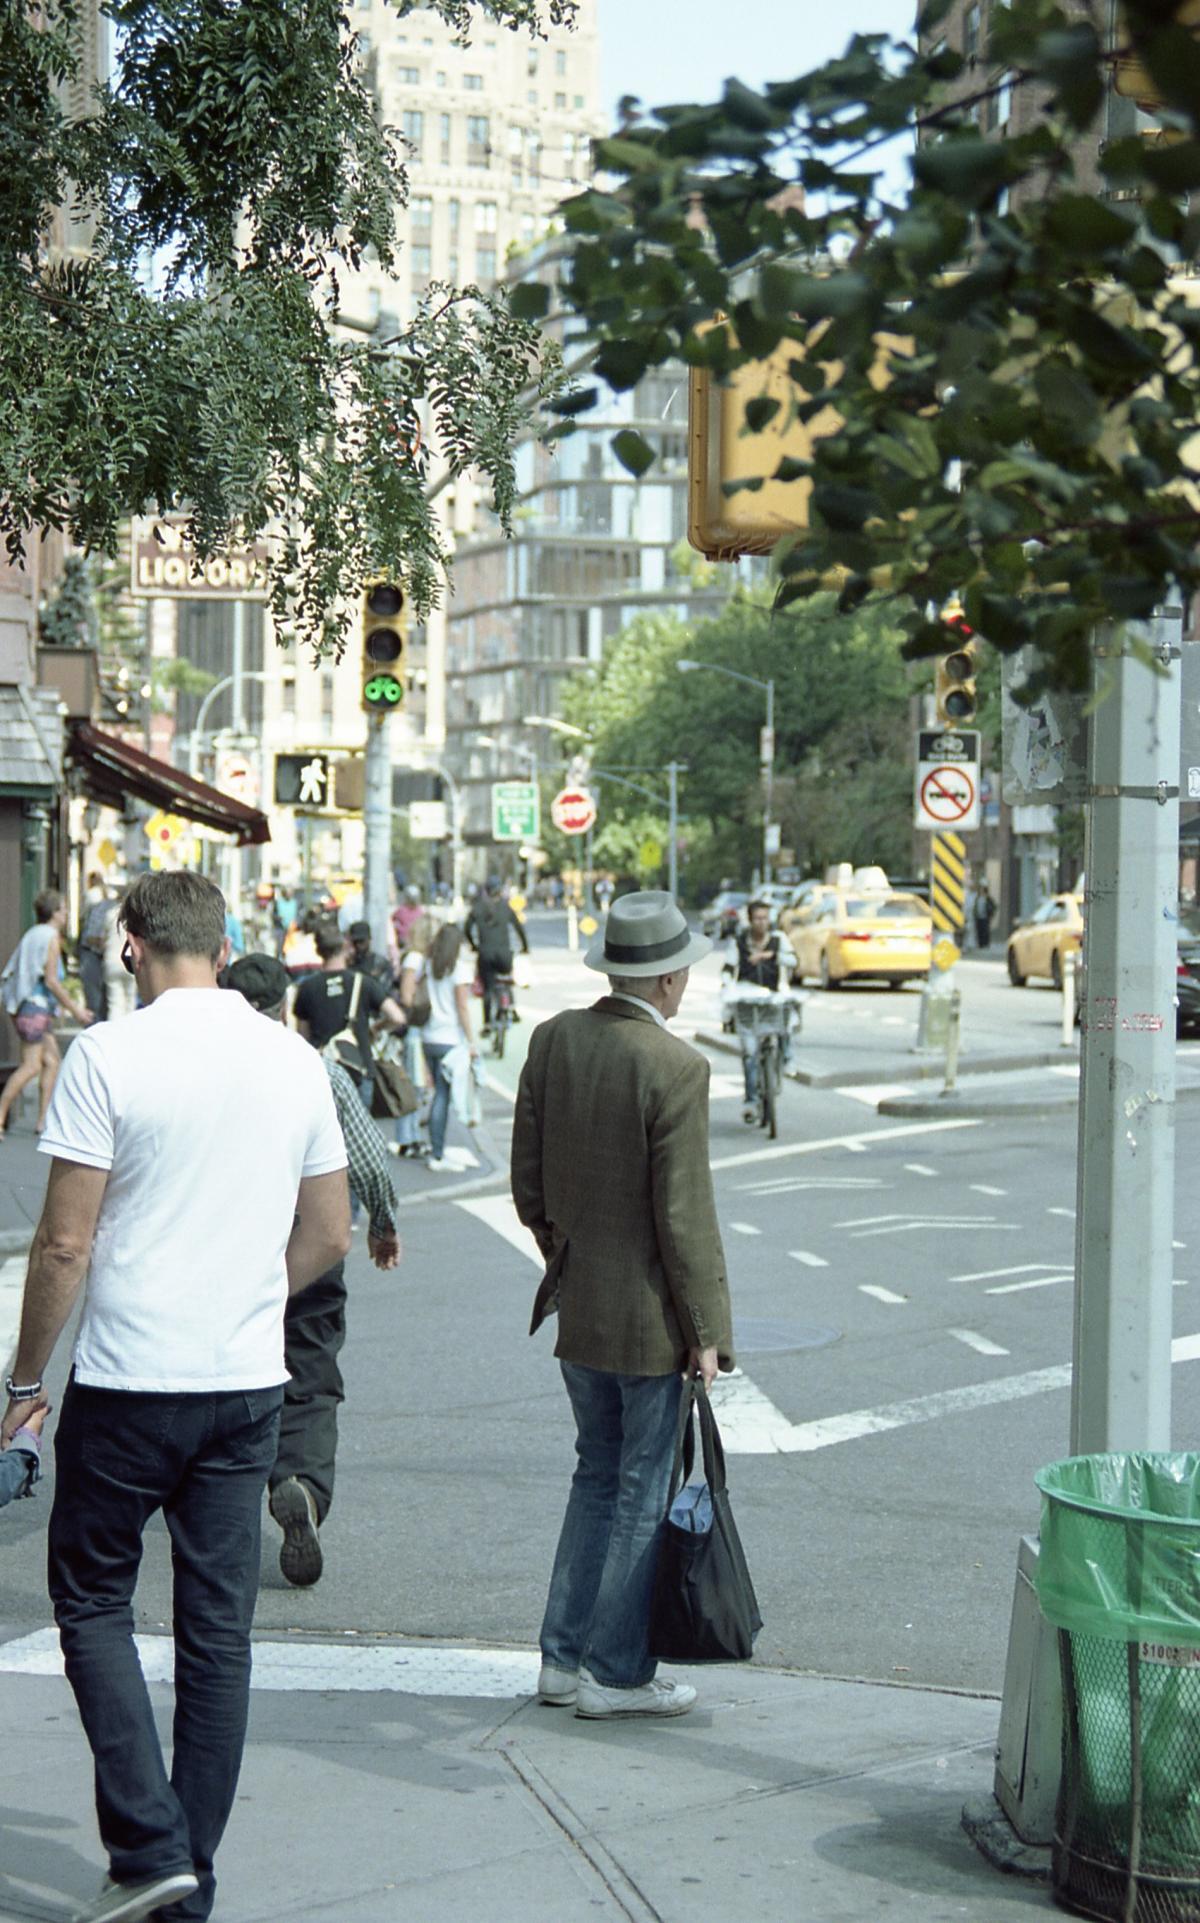 Street City Sidewalk #426196